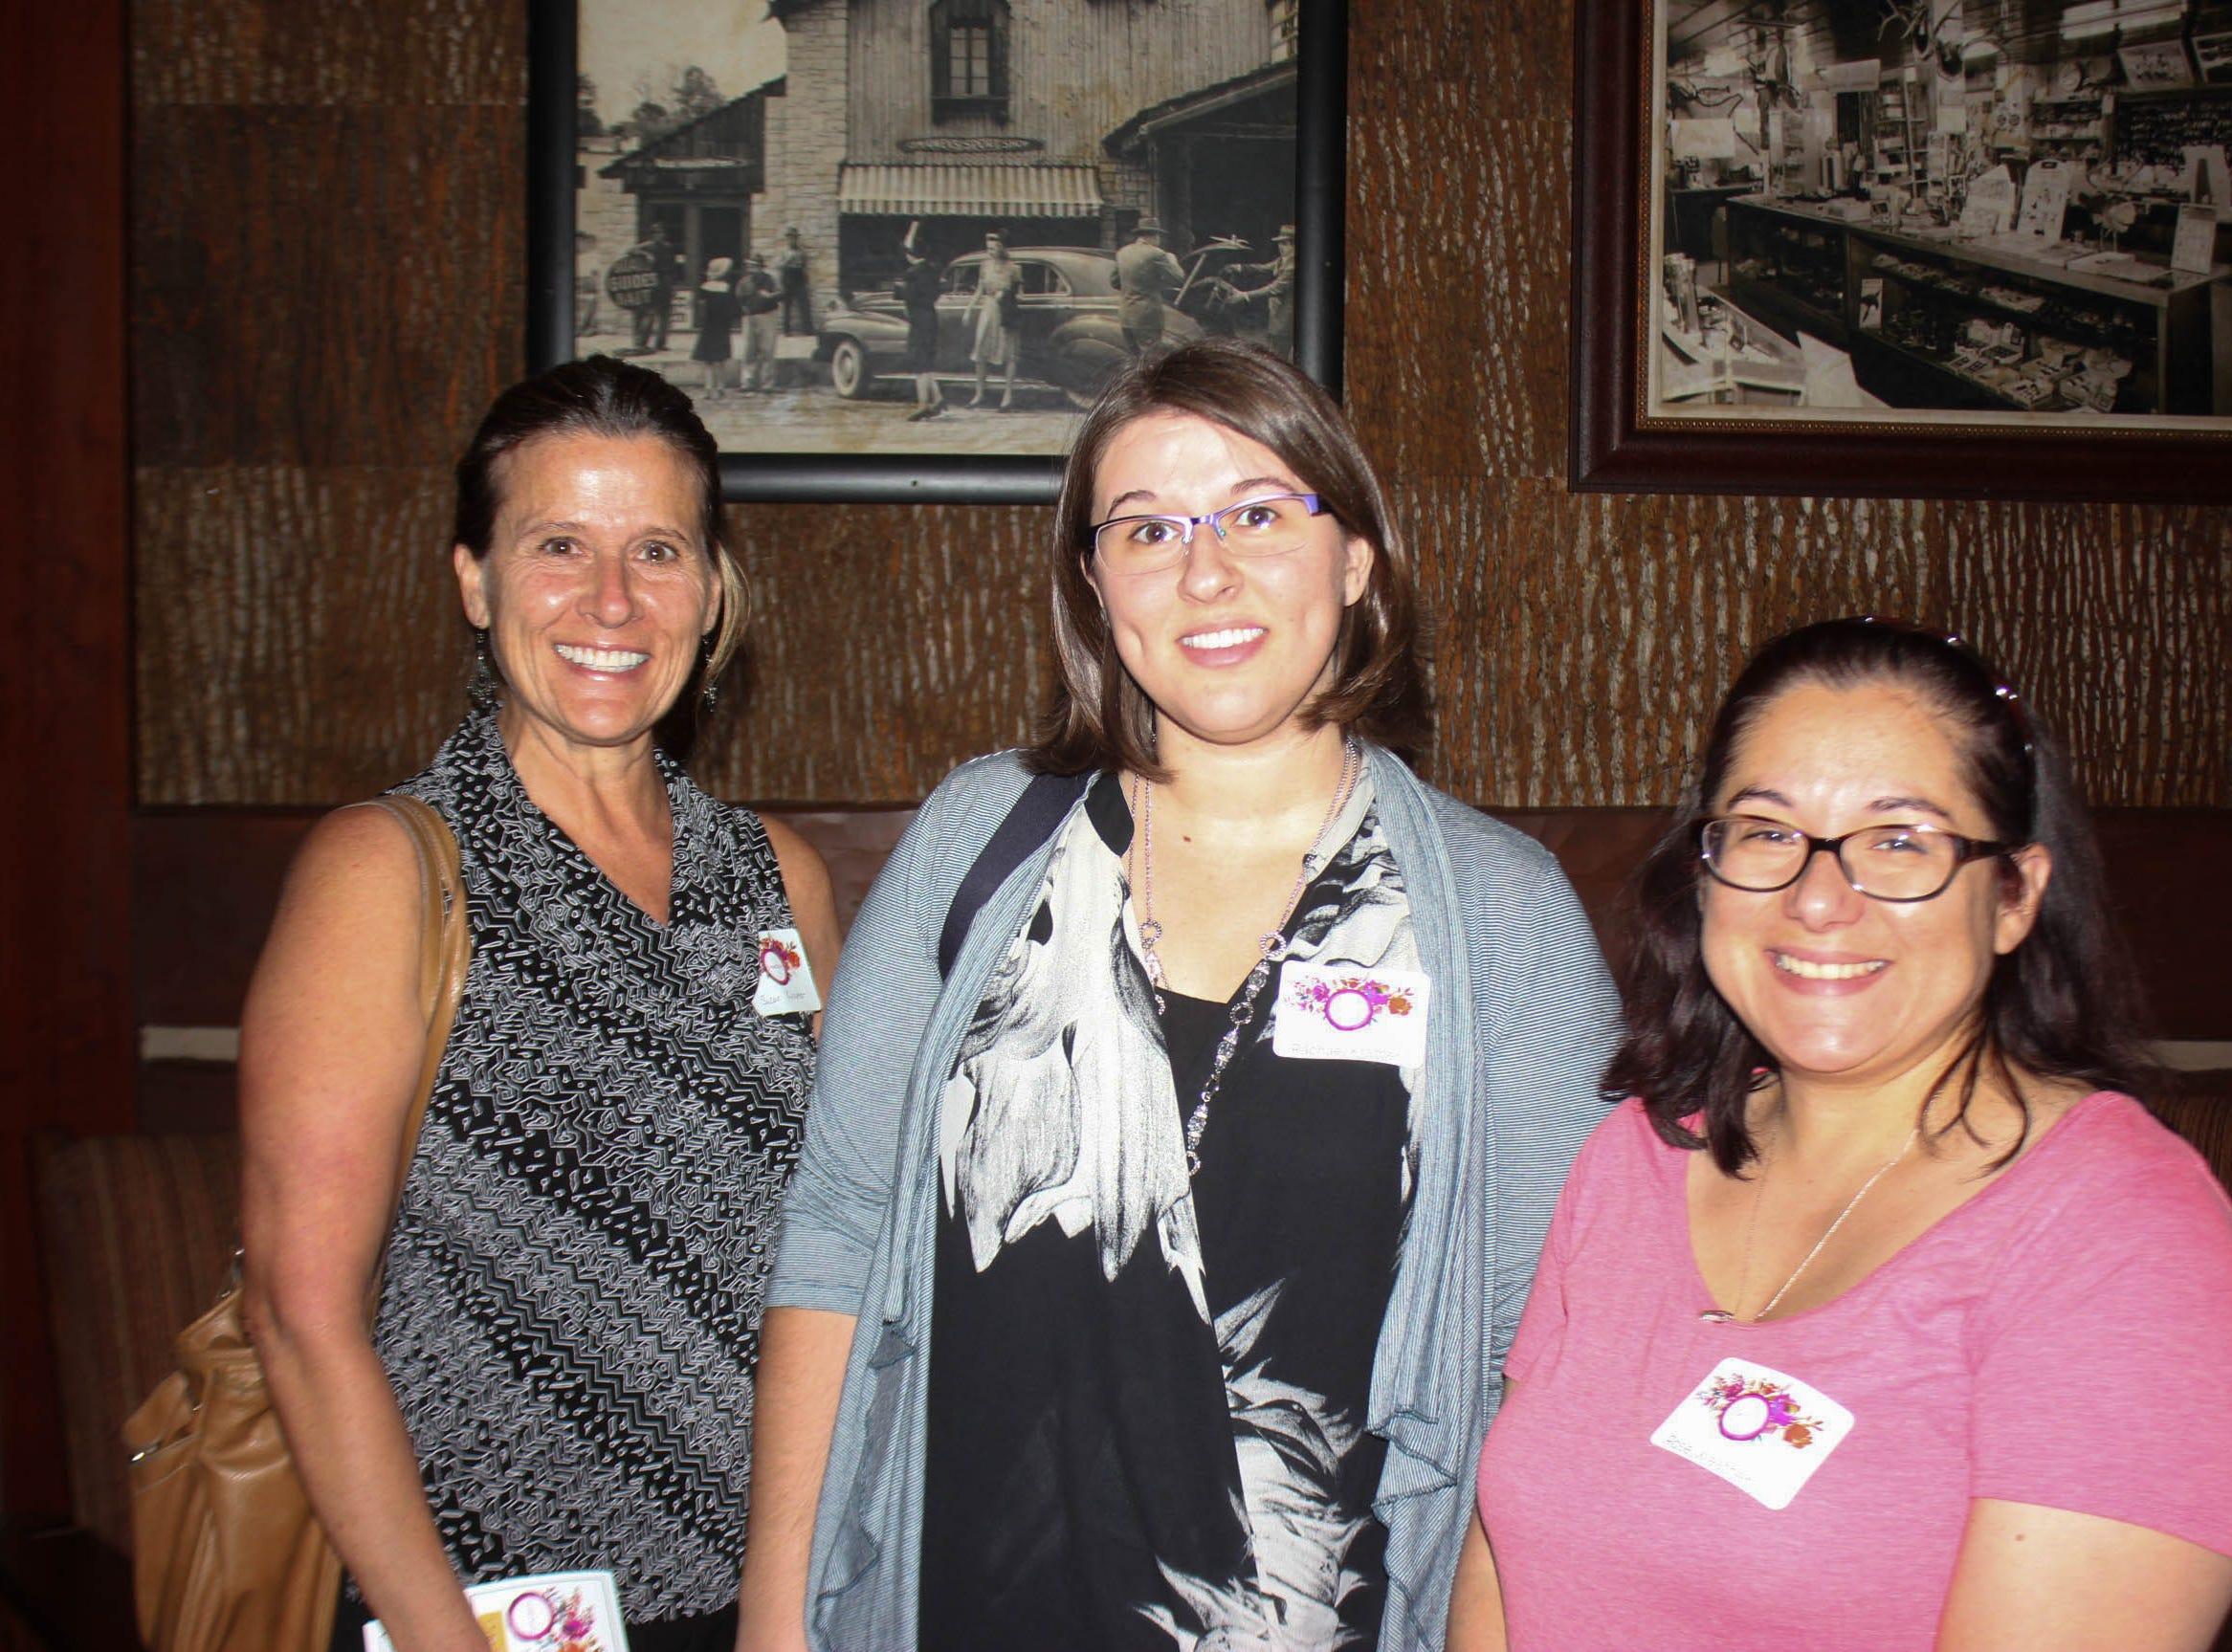 Susan Kramer,Rachel Kramer, and Rose Weatherly